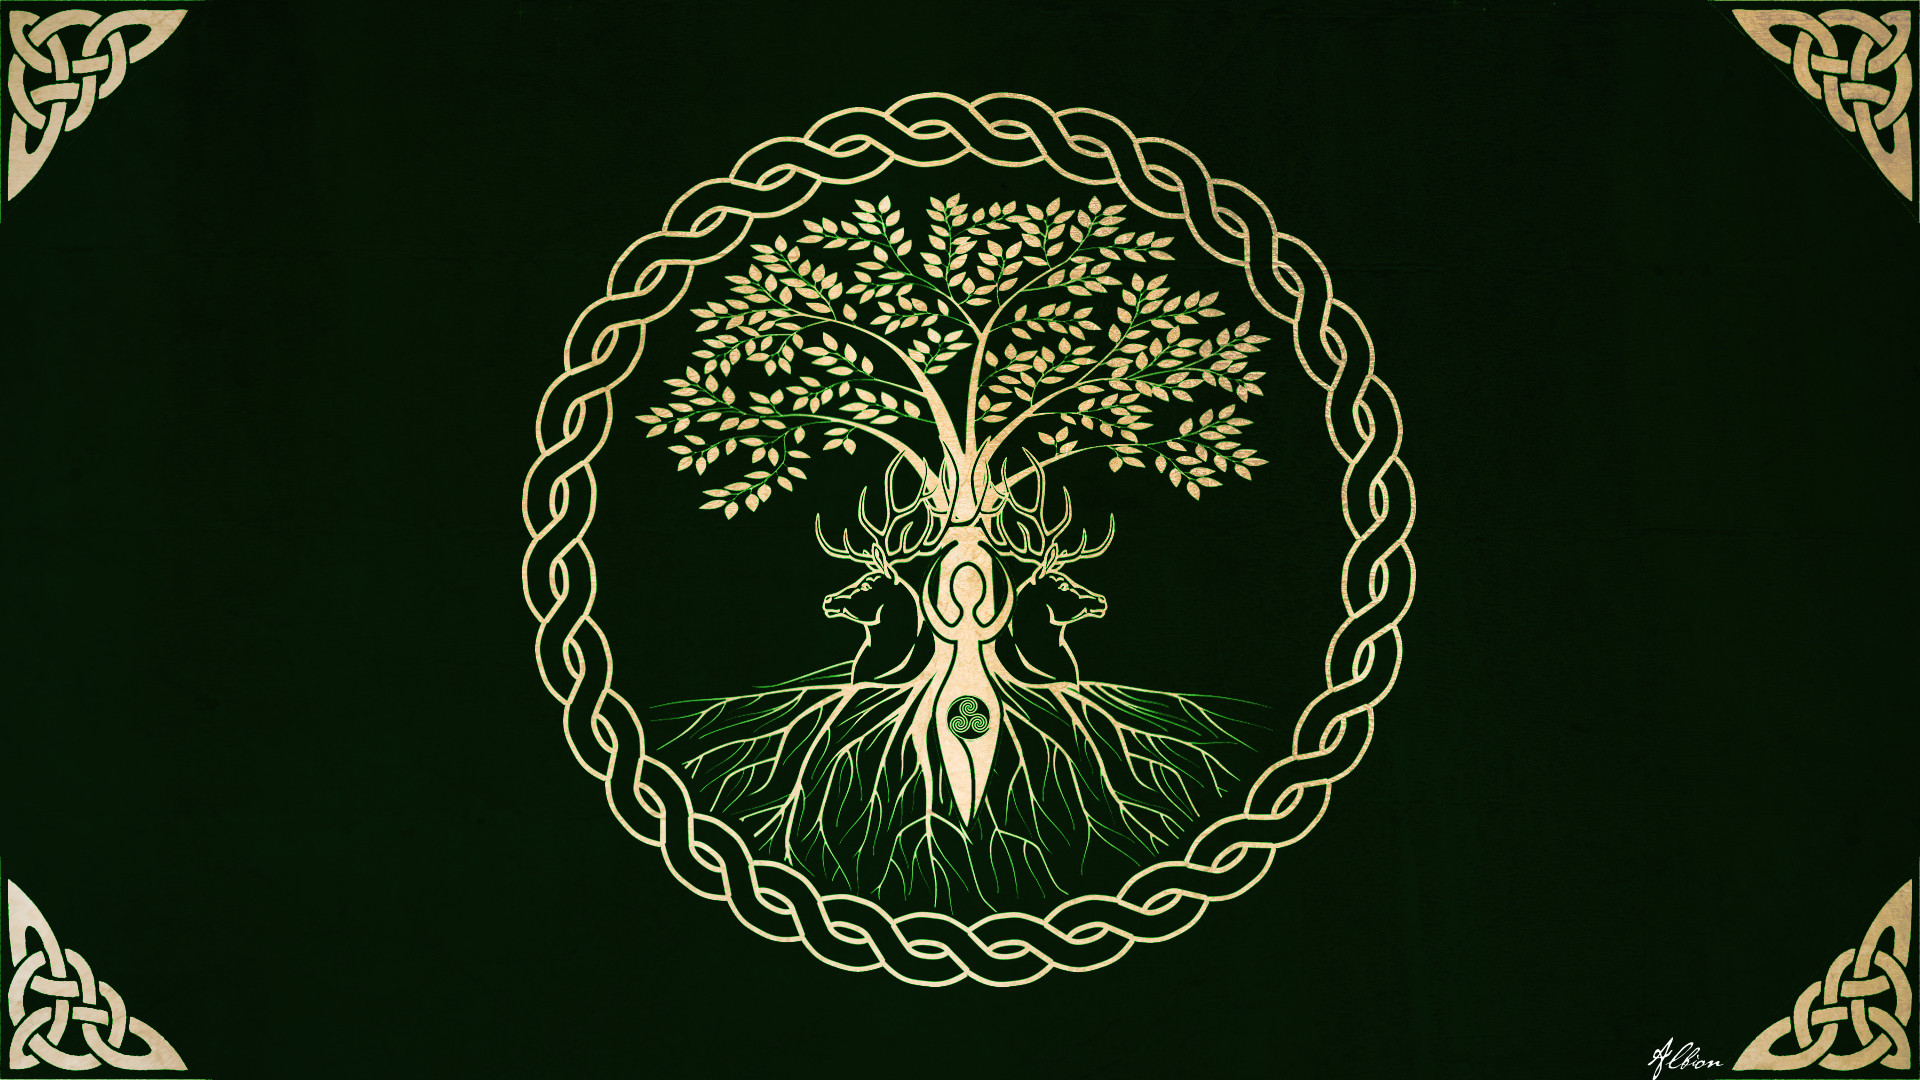 Res: 1920x1080, ... Celtic Knot Wallpapers Desktop - Wallpaper Gallery ...